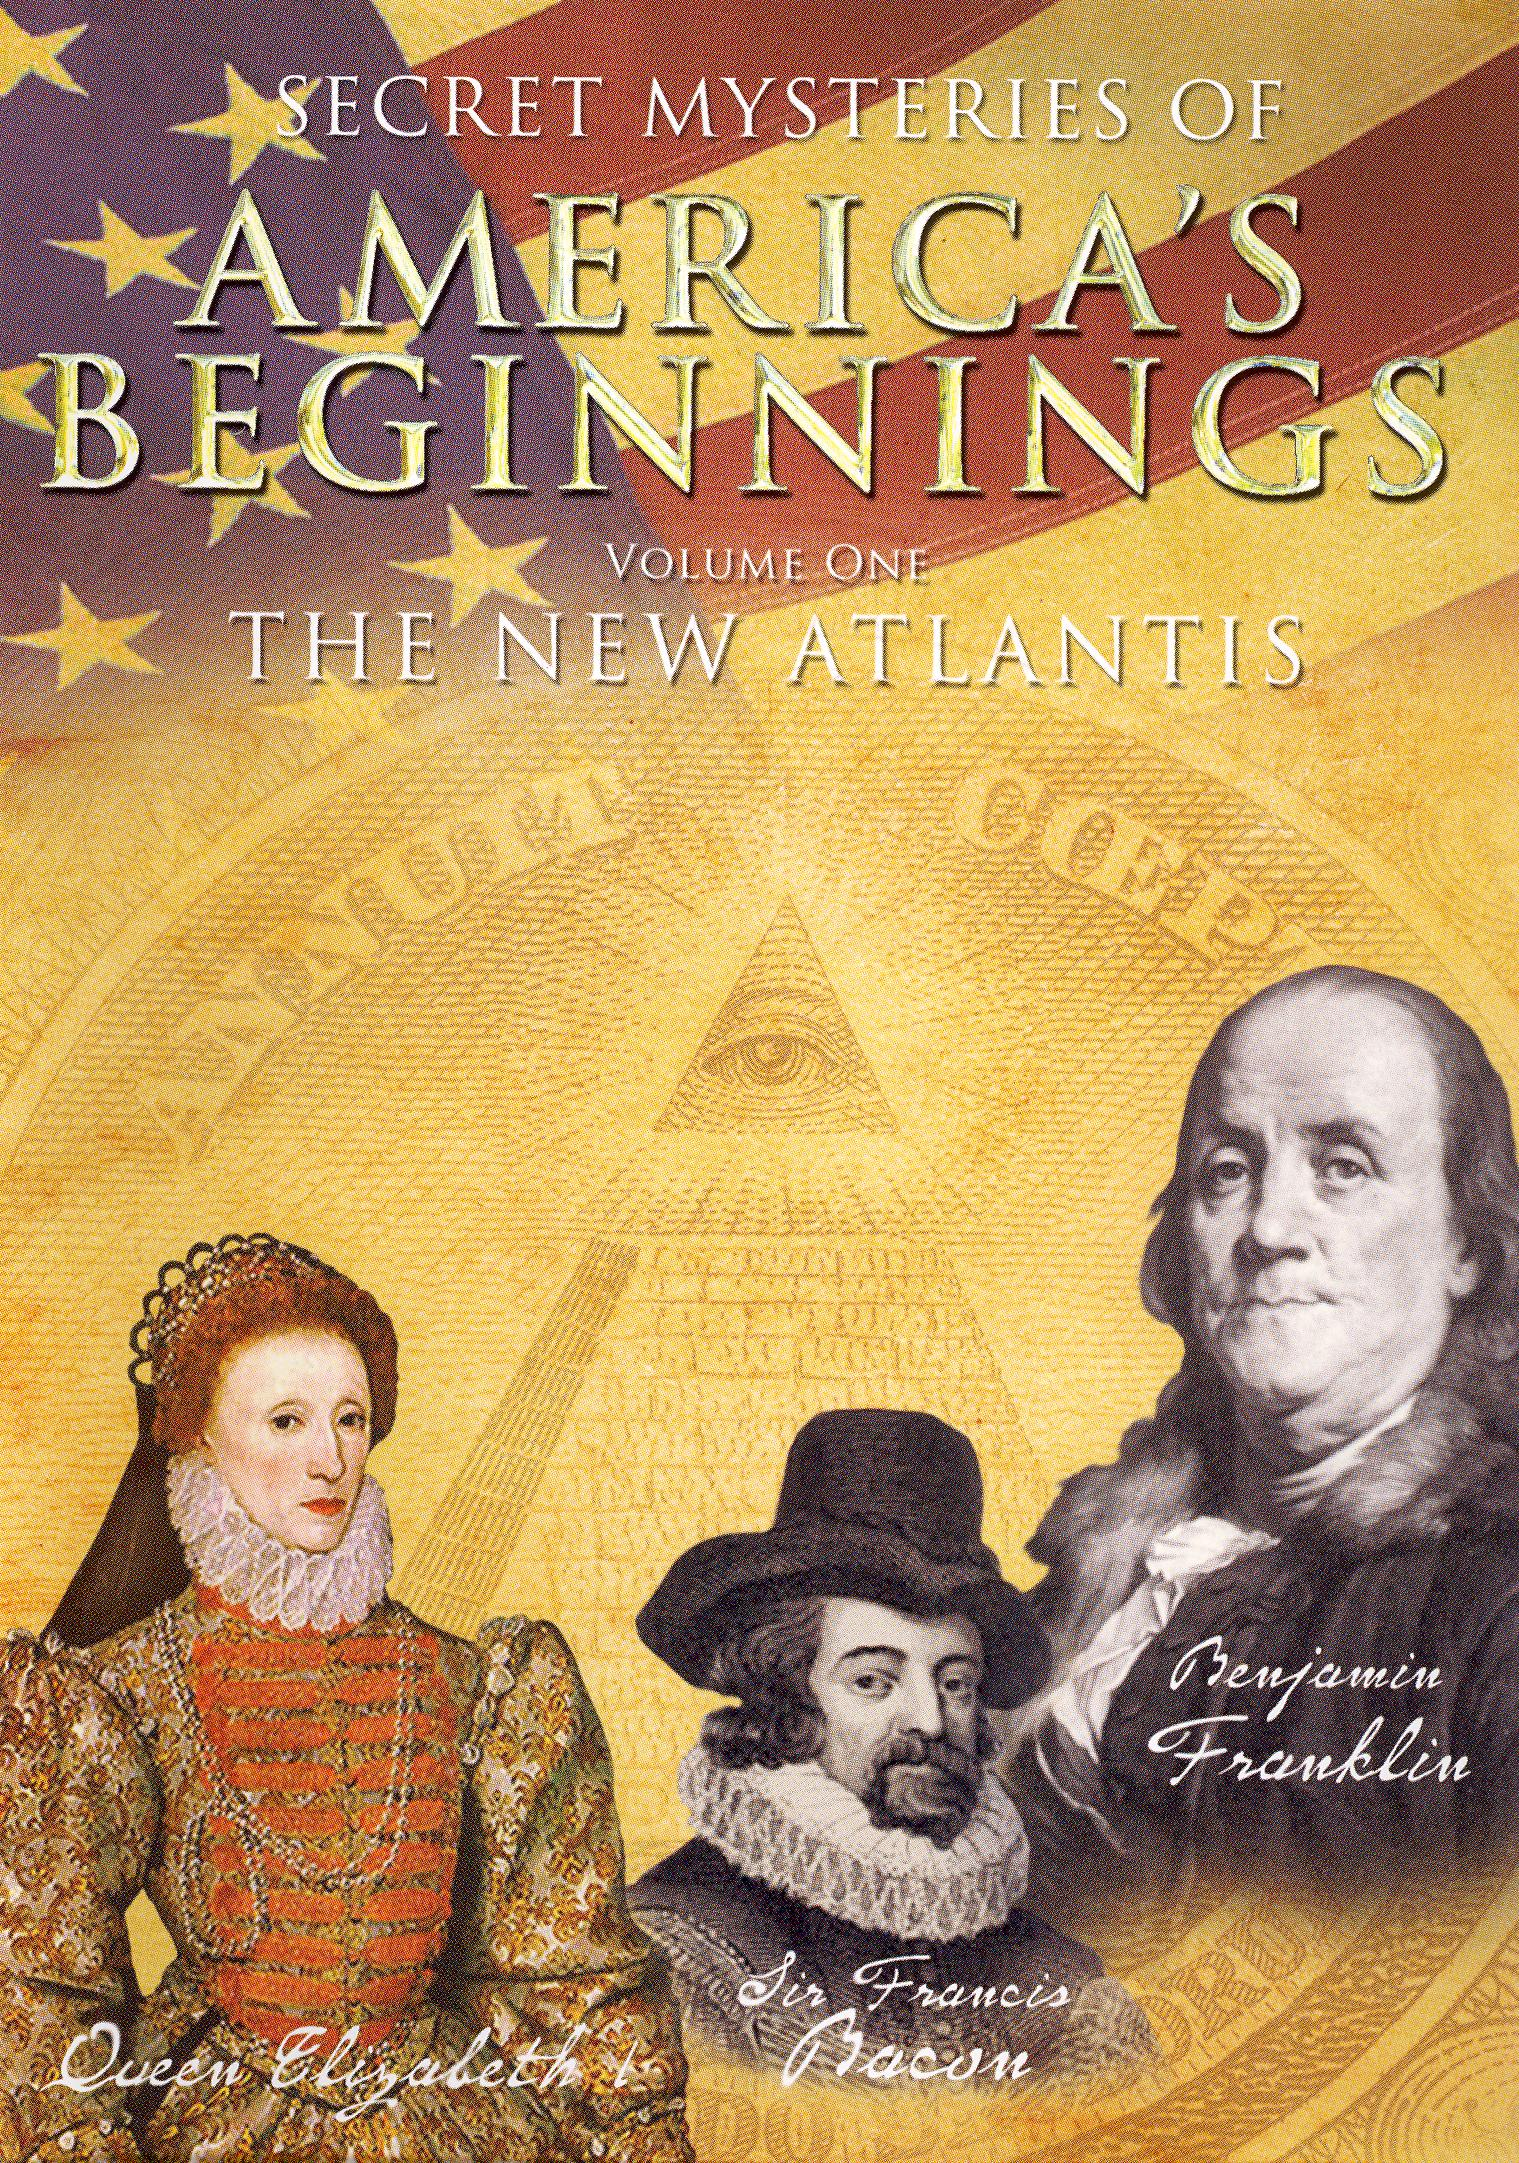 Secret Mysteries of America's Beginnings, Vol. 1: The New Atlantis